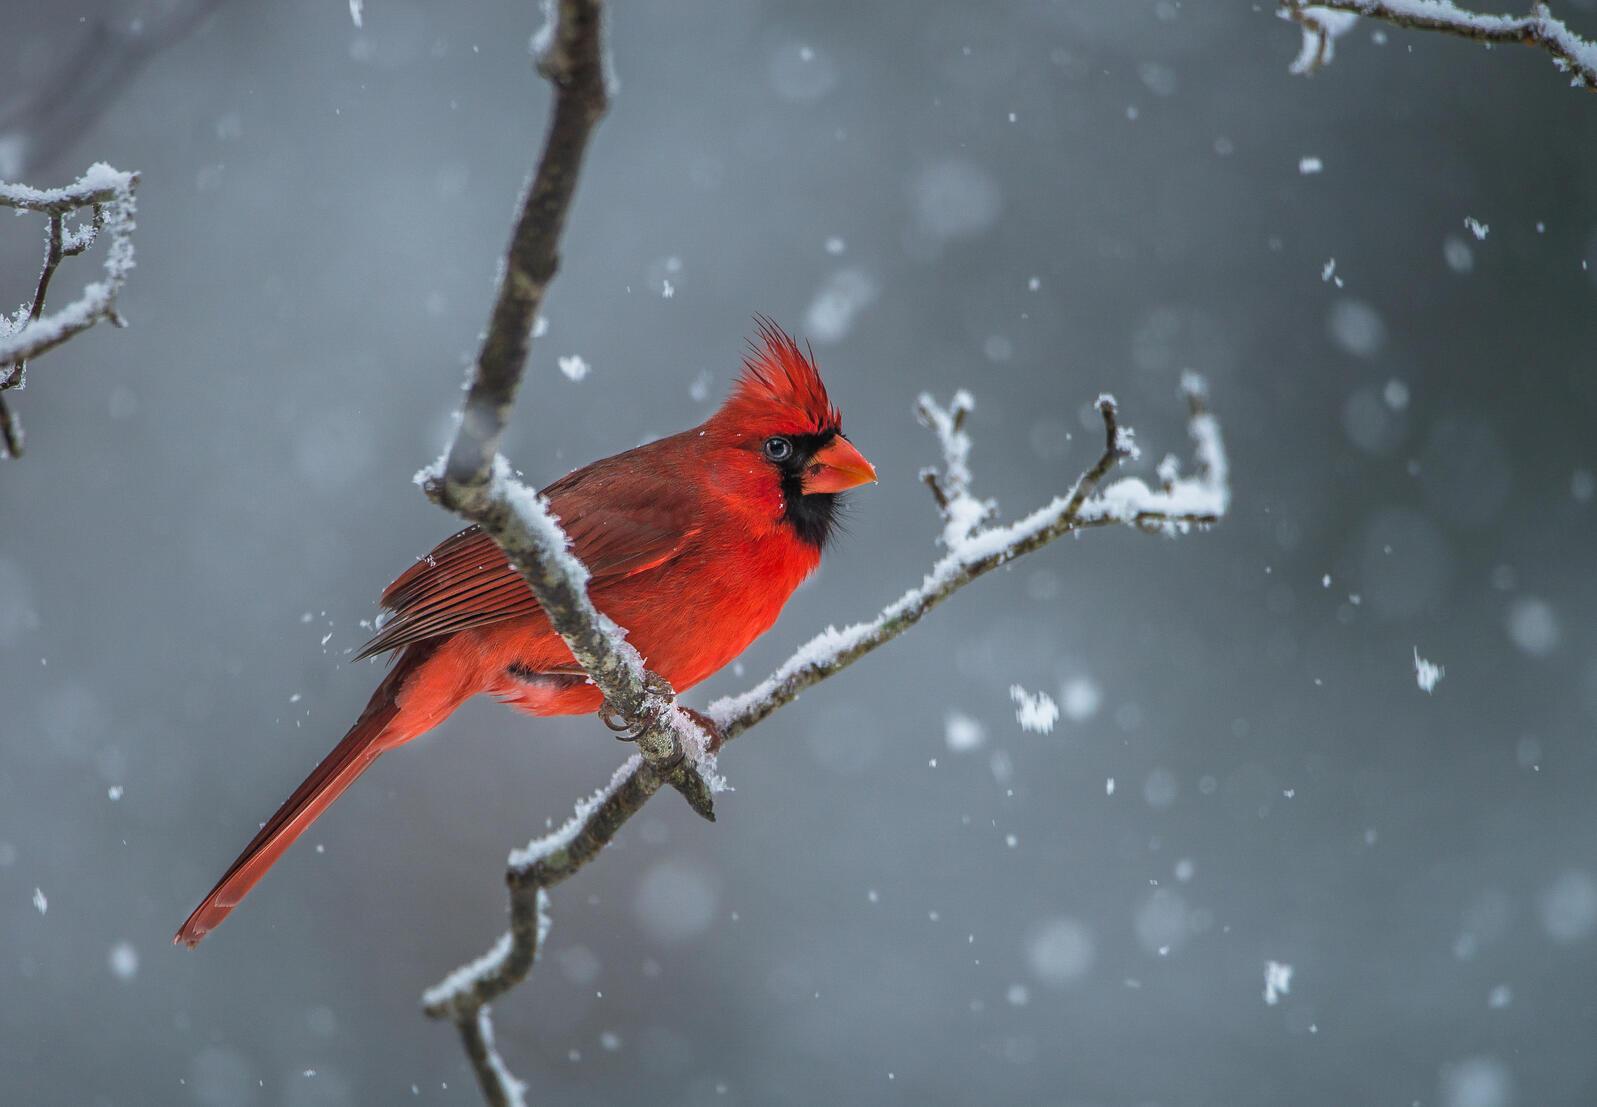 Northern Cardinal. Chokchai Leangsuksun/Audubon Photography Awards